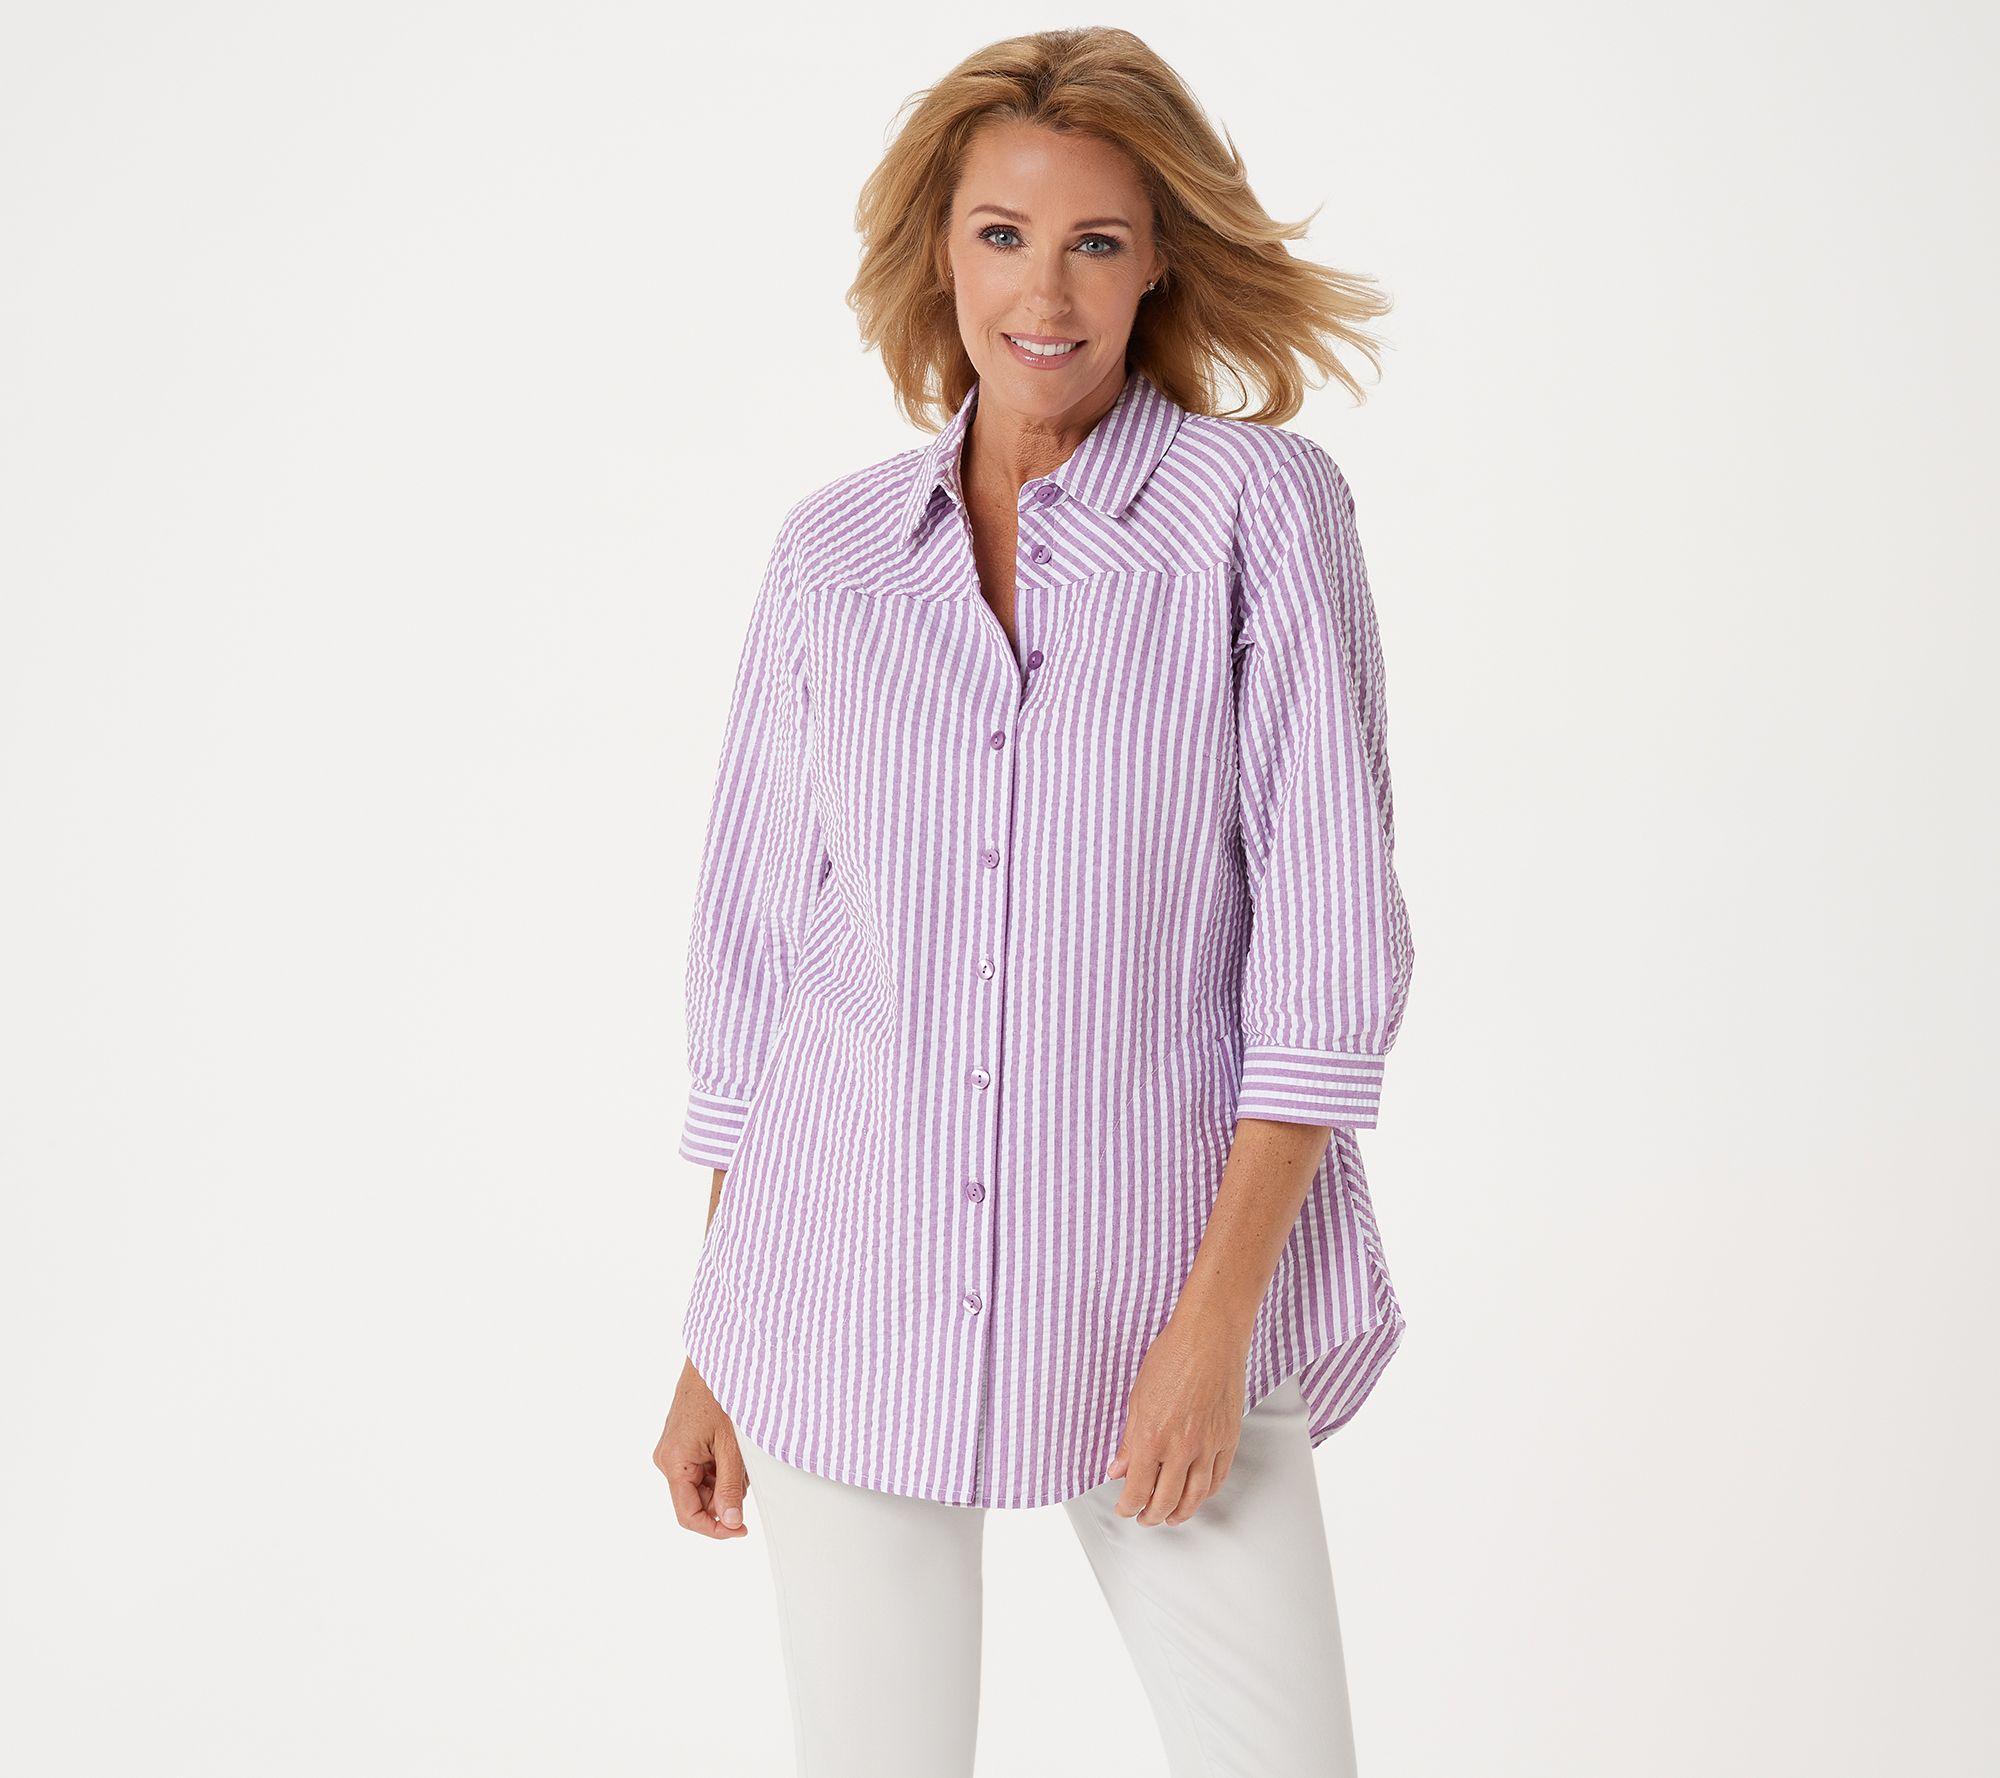 77dcd59c1b1e Joan Rivers 3 4 Sleeve Seersucker Shirt w  Back Button Detail - Page ...